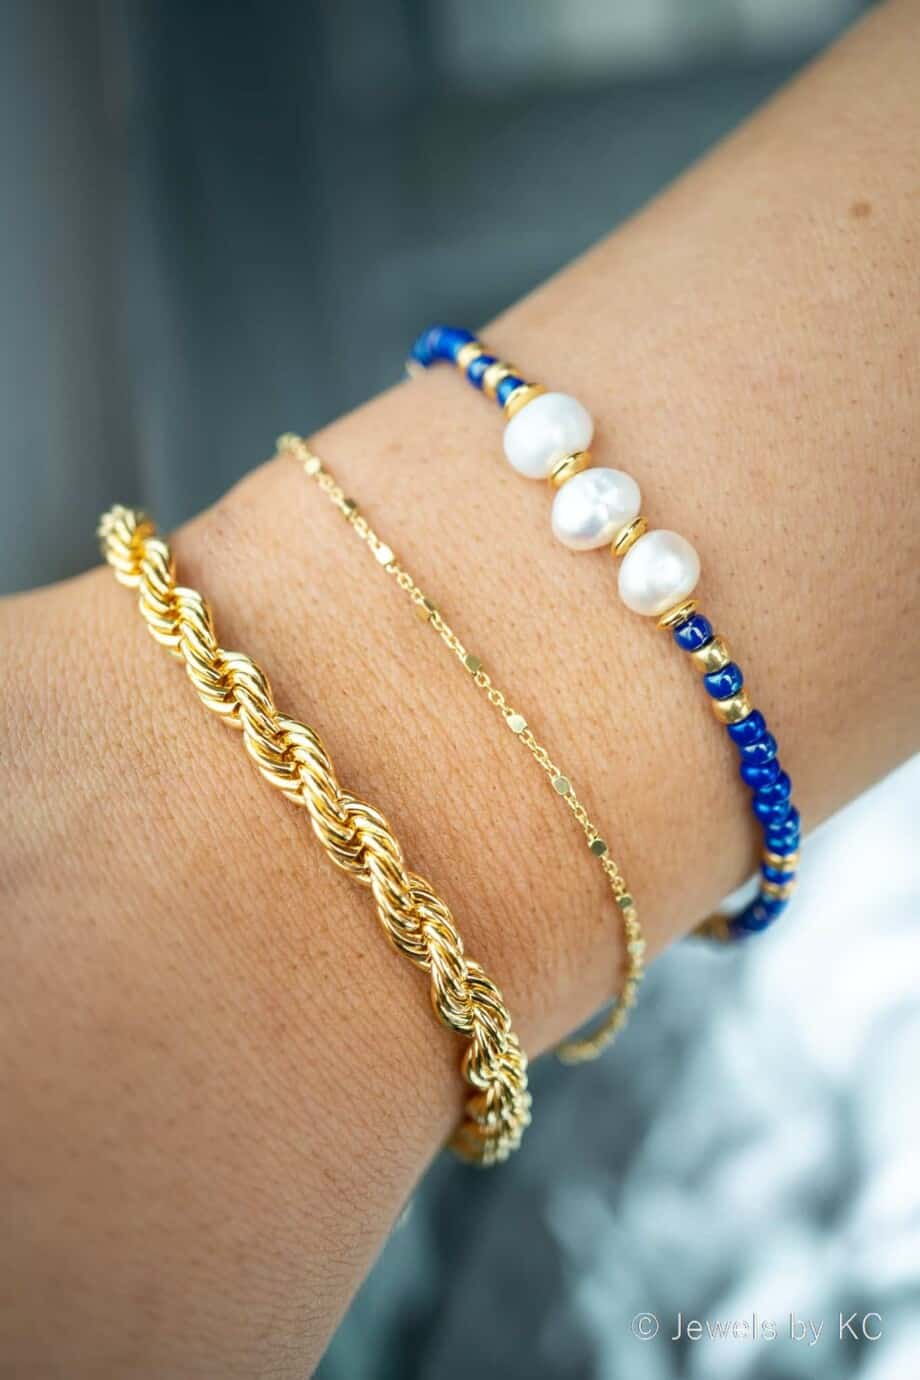 Gouden armbandjes en blauw Miyuki Armbandje 'Purple Blue' met Zoetwater parels